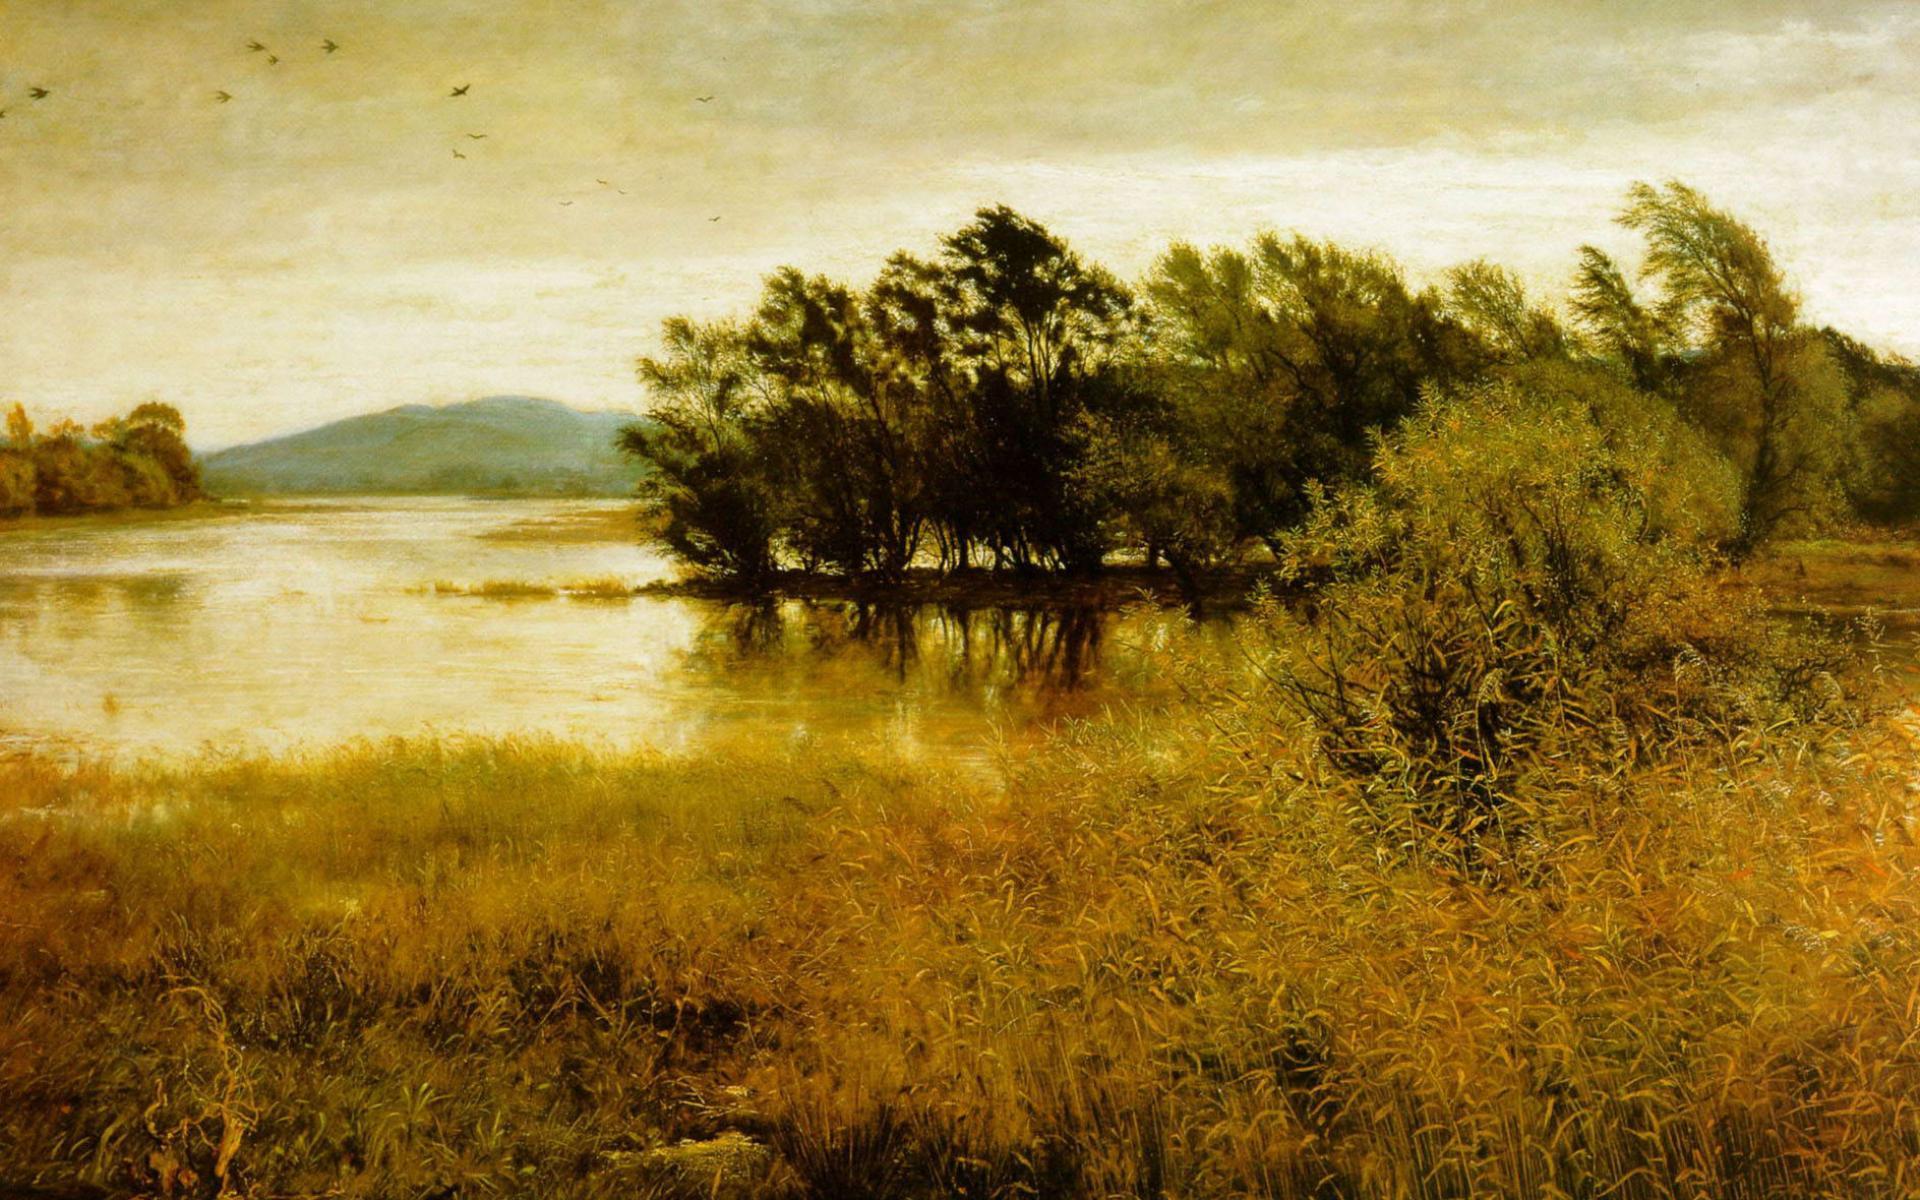 Обои нарисованный пейзаж 1920x1200